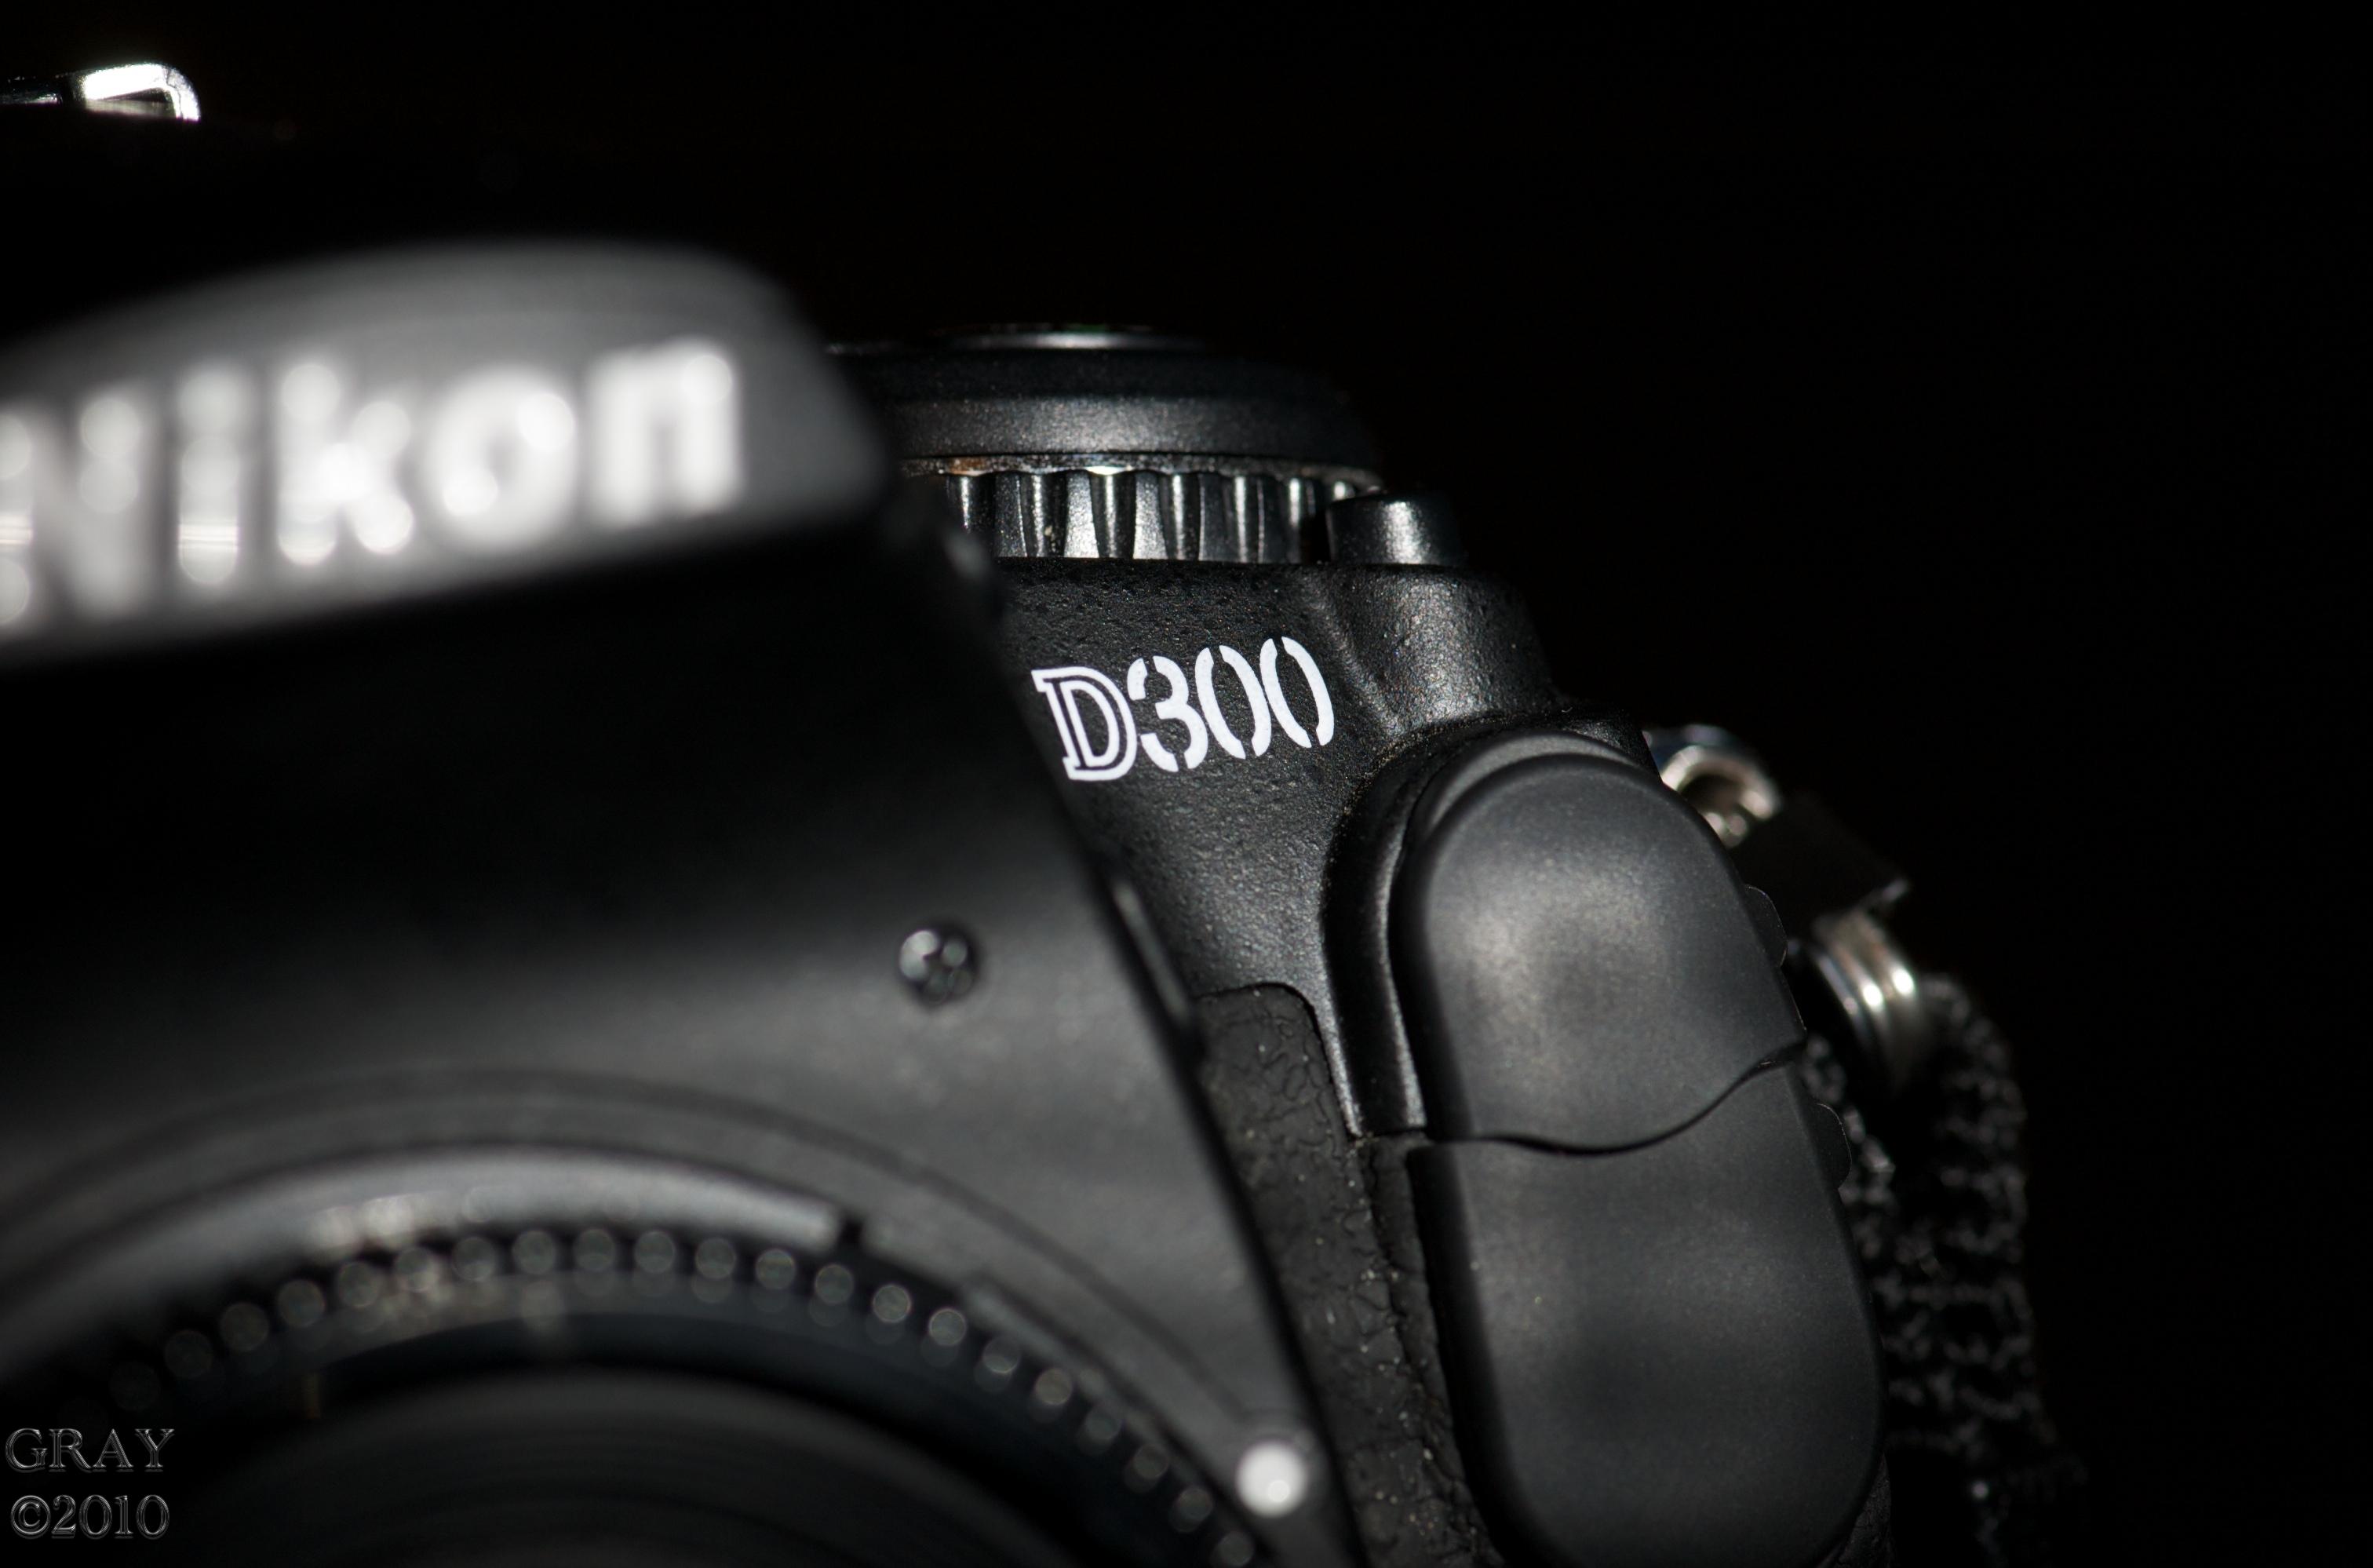 Nikon D300 Full Frame Or Crop | Frameswalls.org